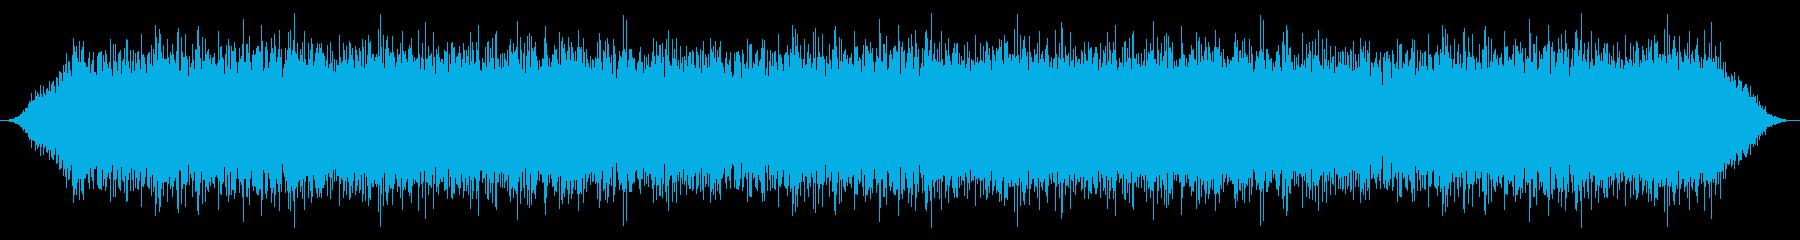 PC 駆動音02-07(ロング)の再生済みの波形